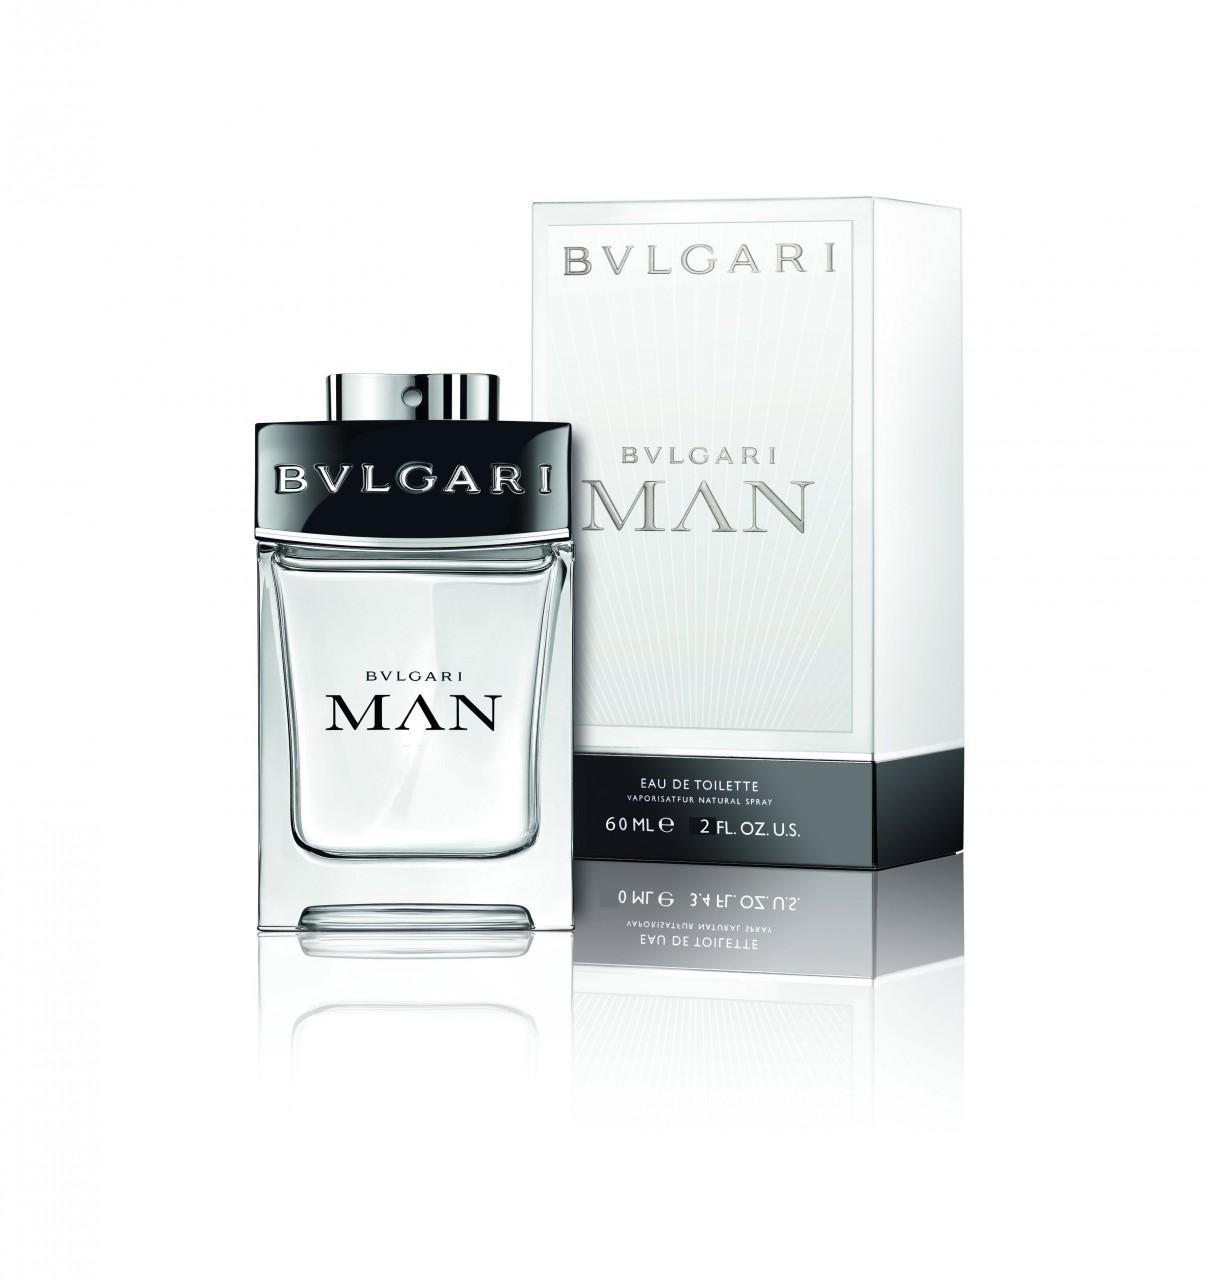 Bvlgari Bvlgari Man, Toaletní voda, 60ml, Pánska vôňa